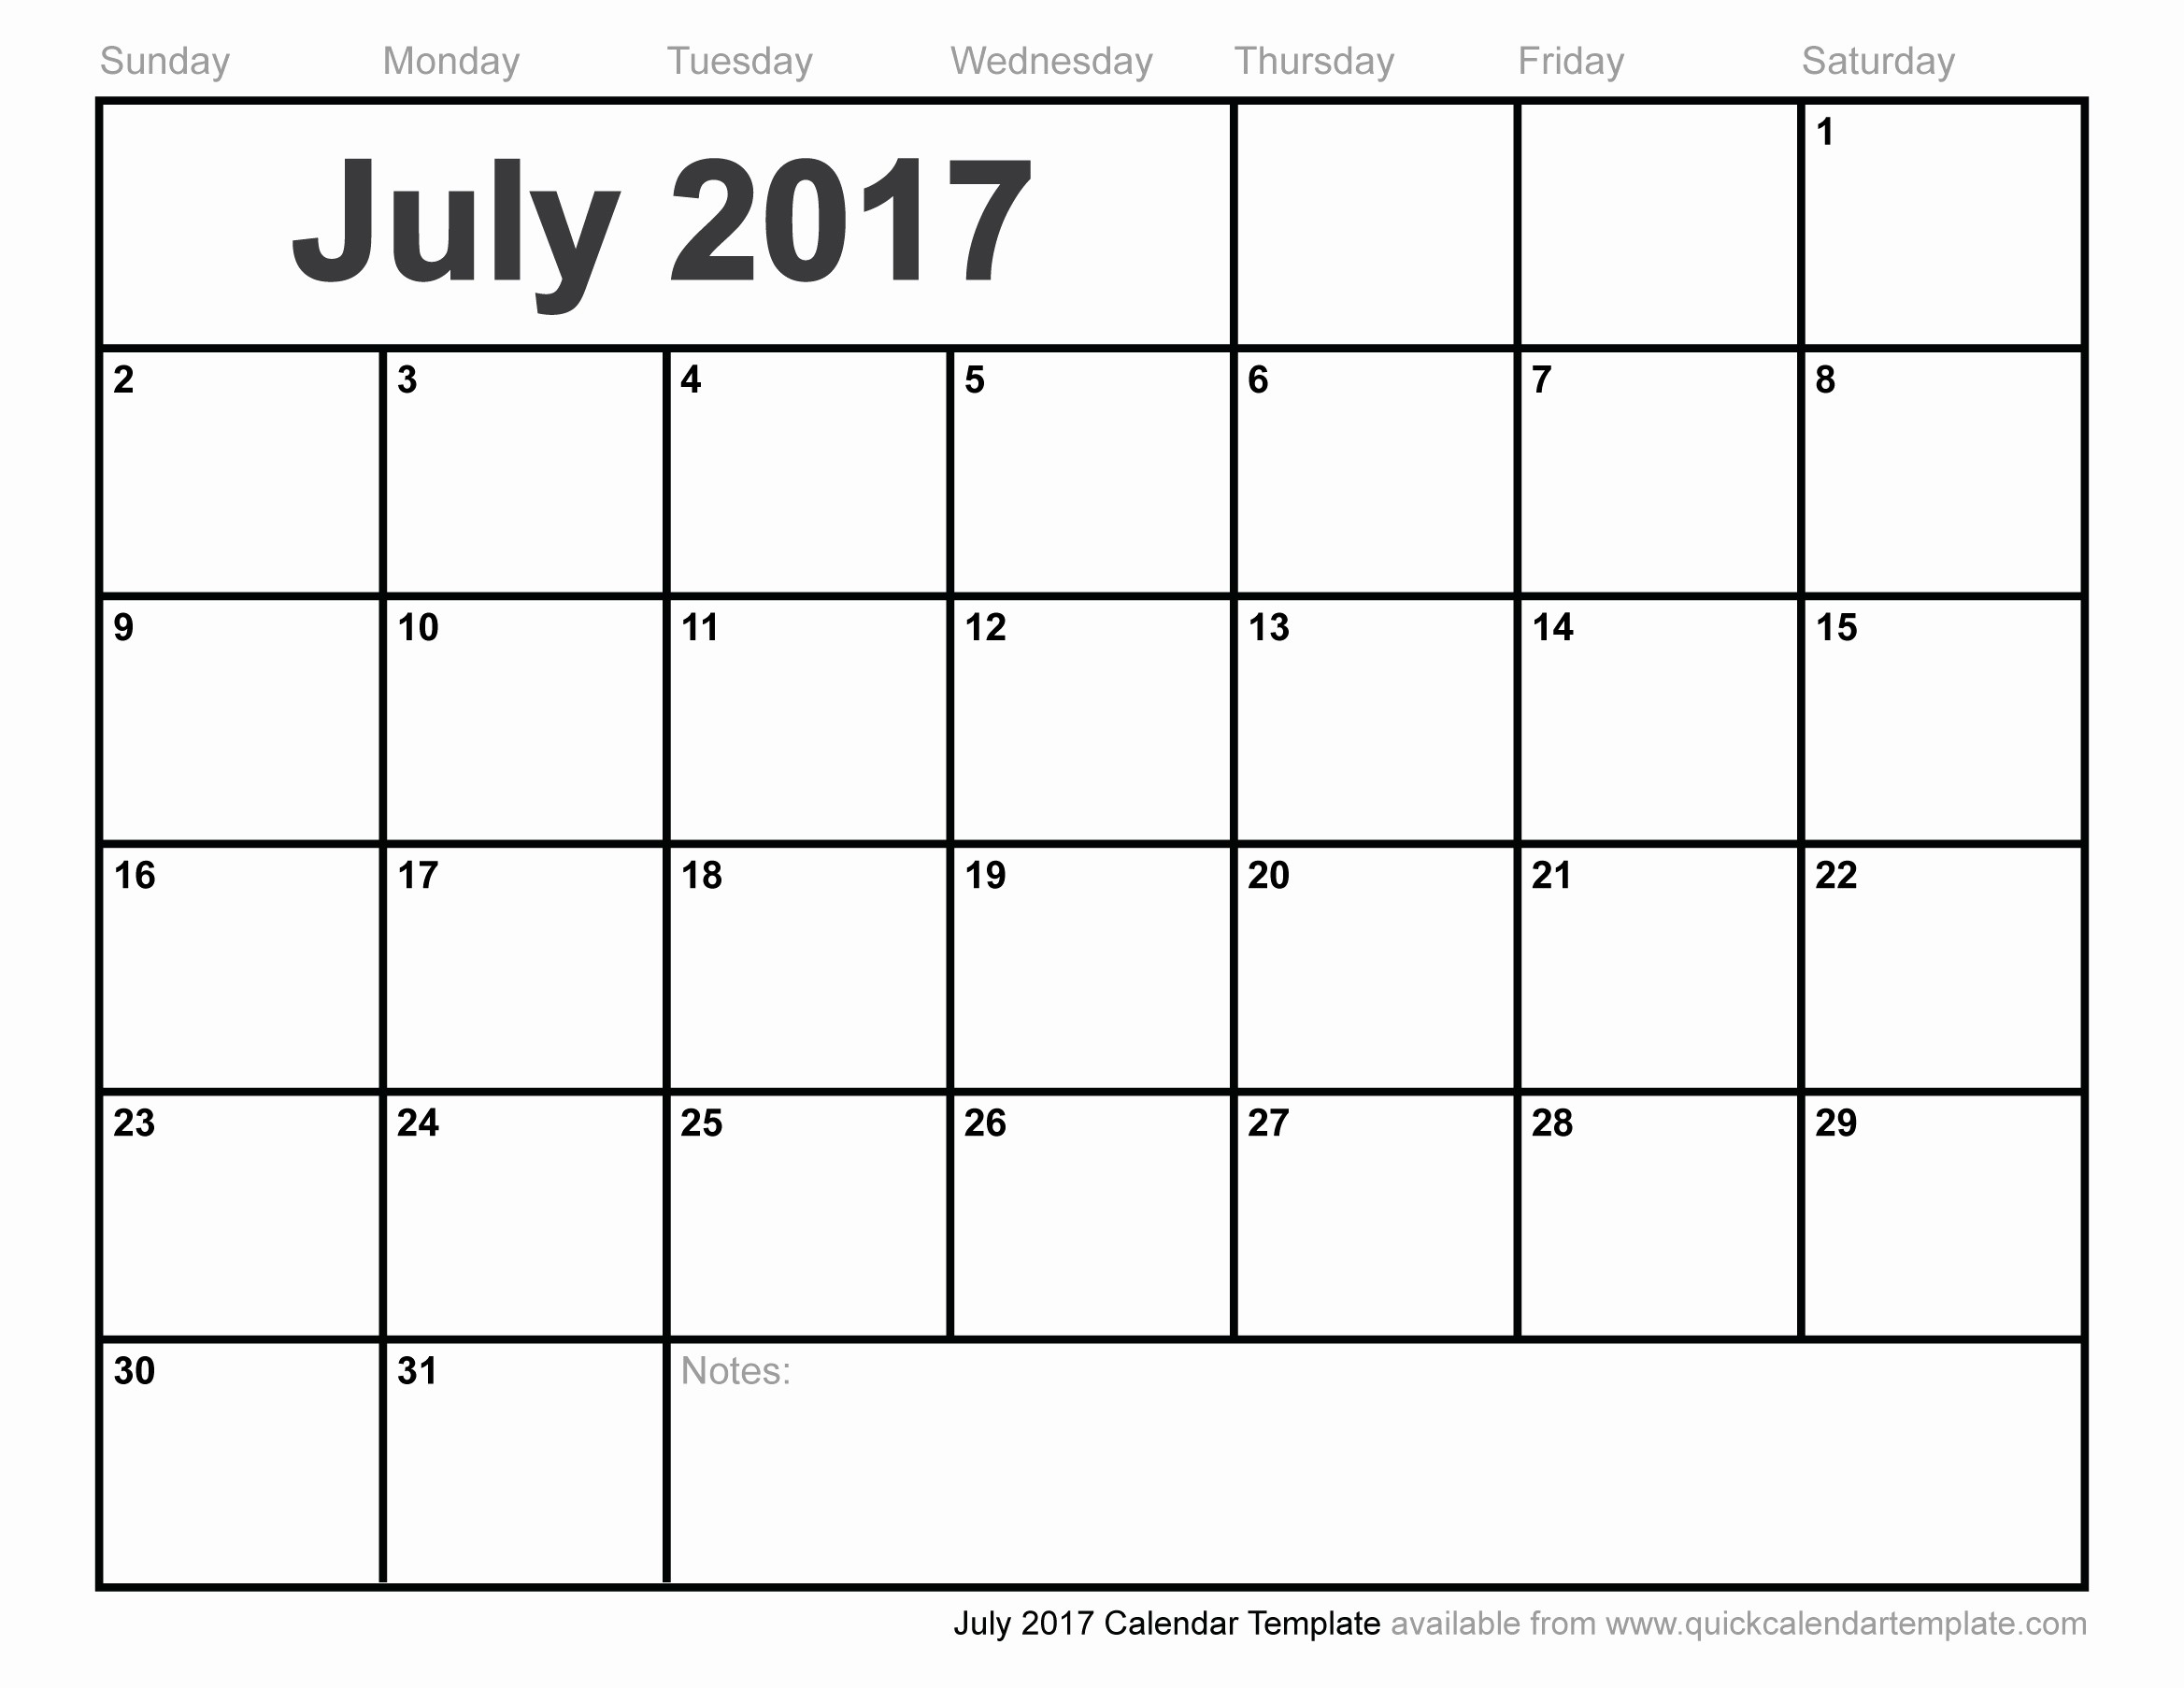 2017 Quarterly Calendar Template Excel Fresh July 2017 Calendar Pdf